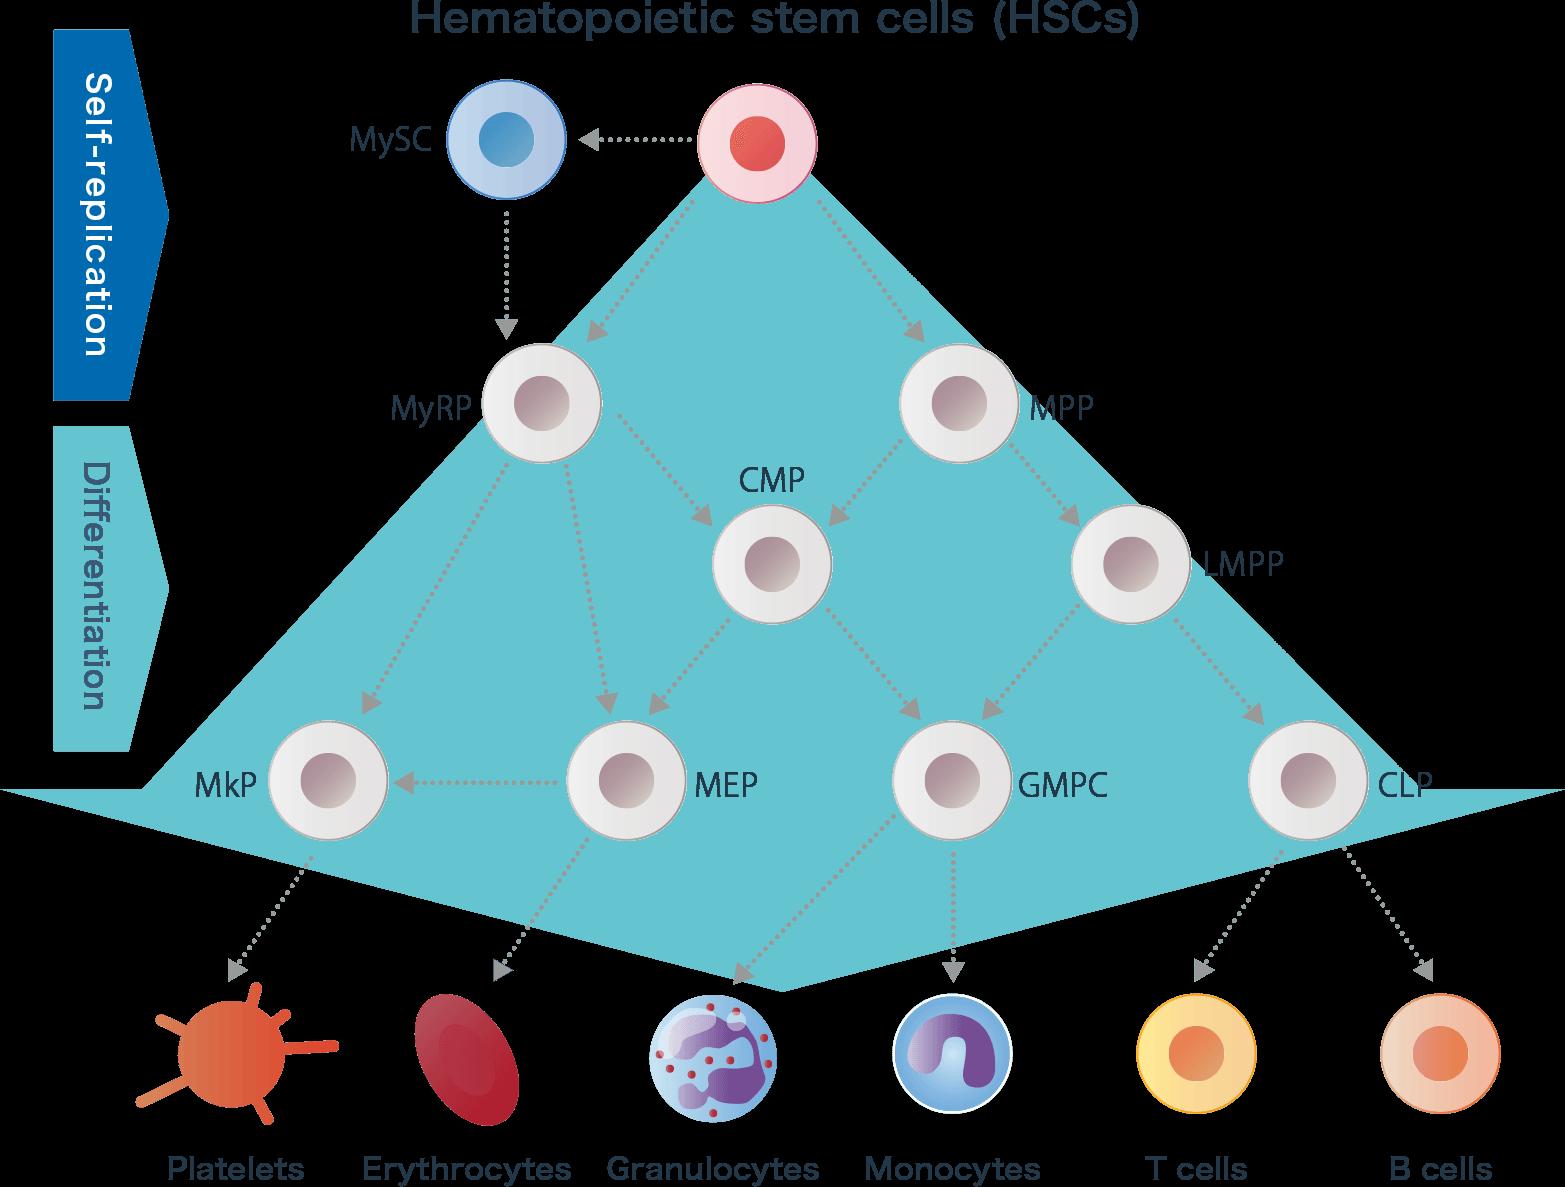 What are hematopoietic stem cells